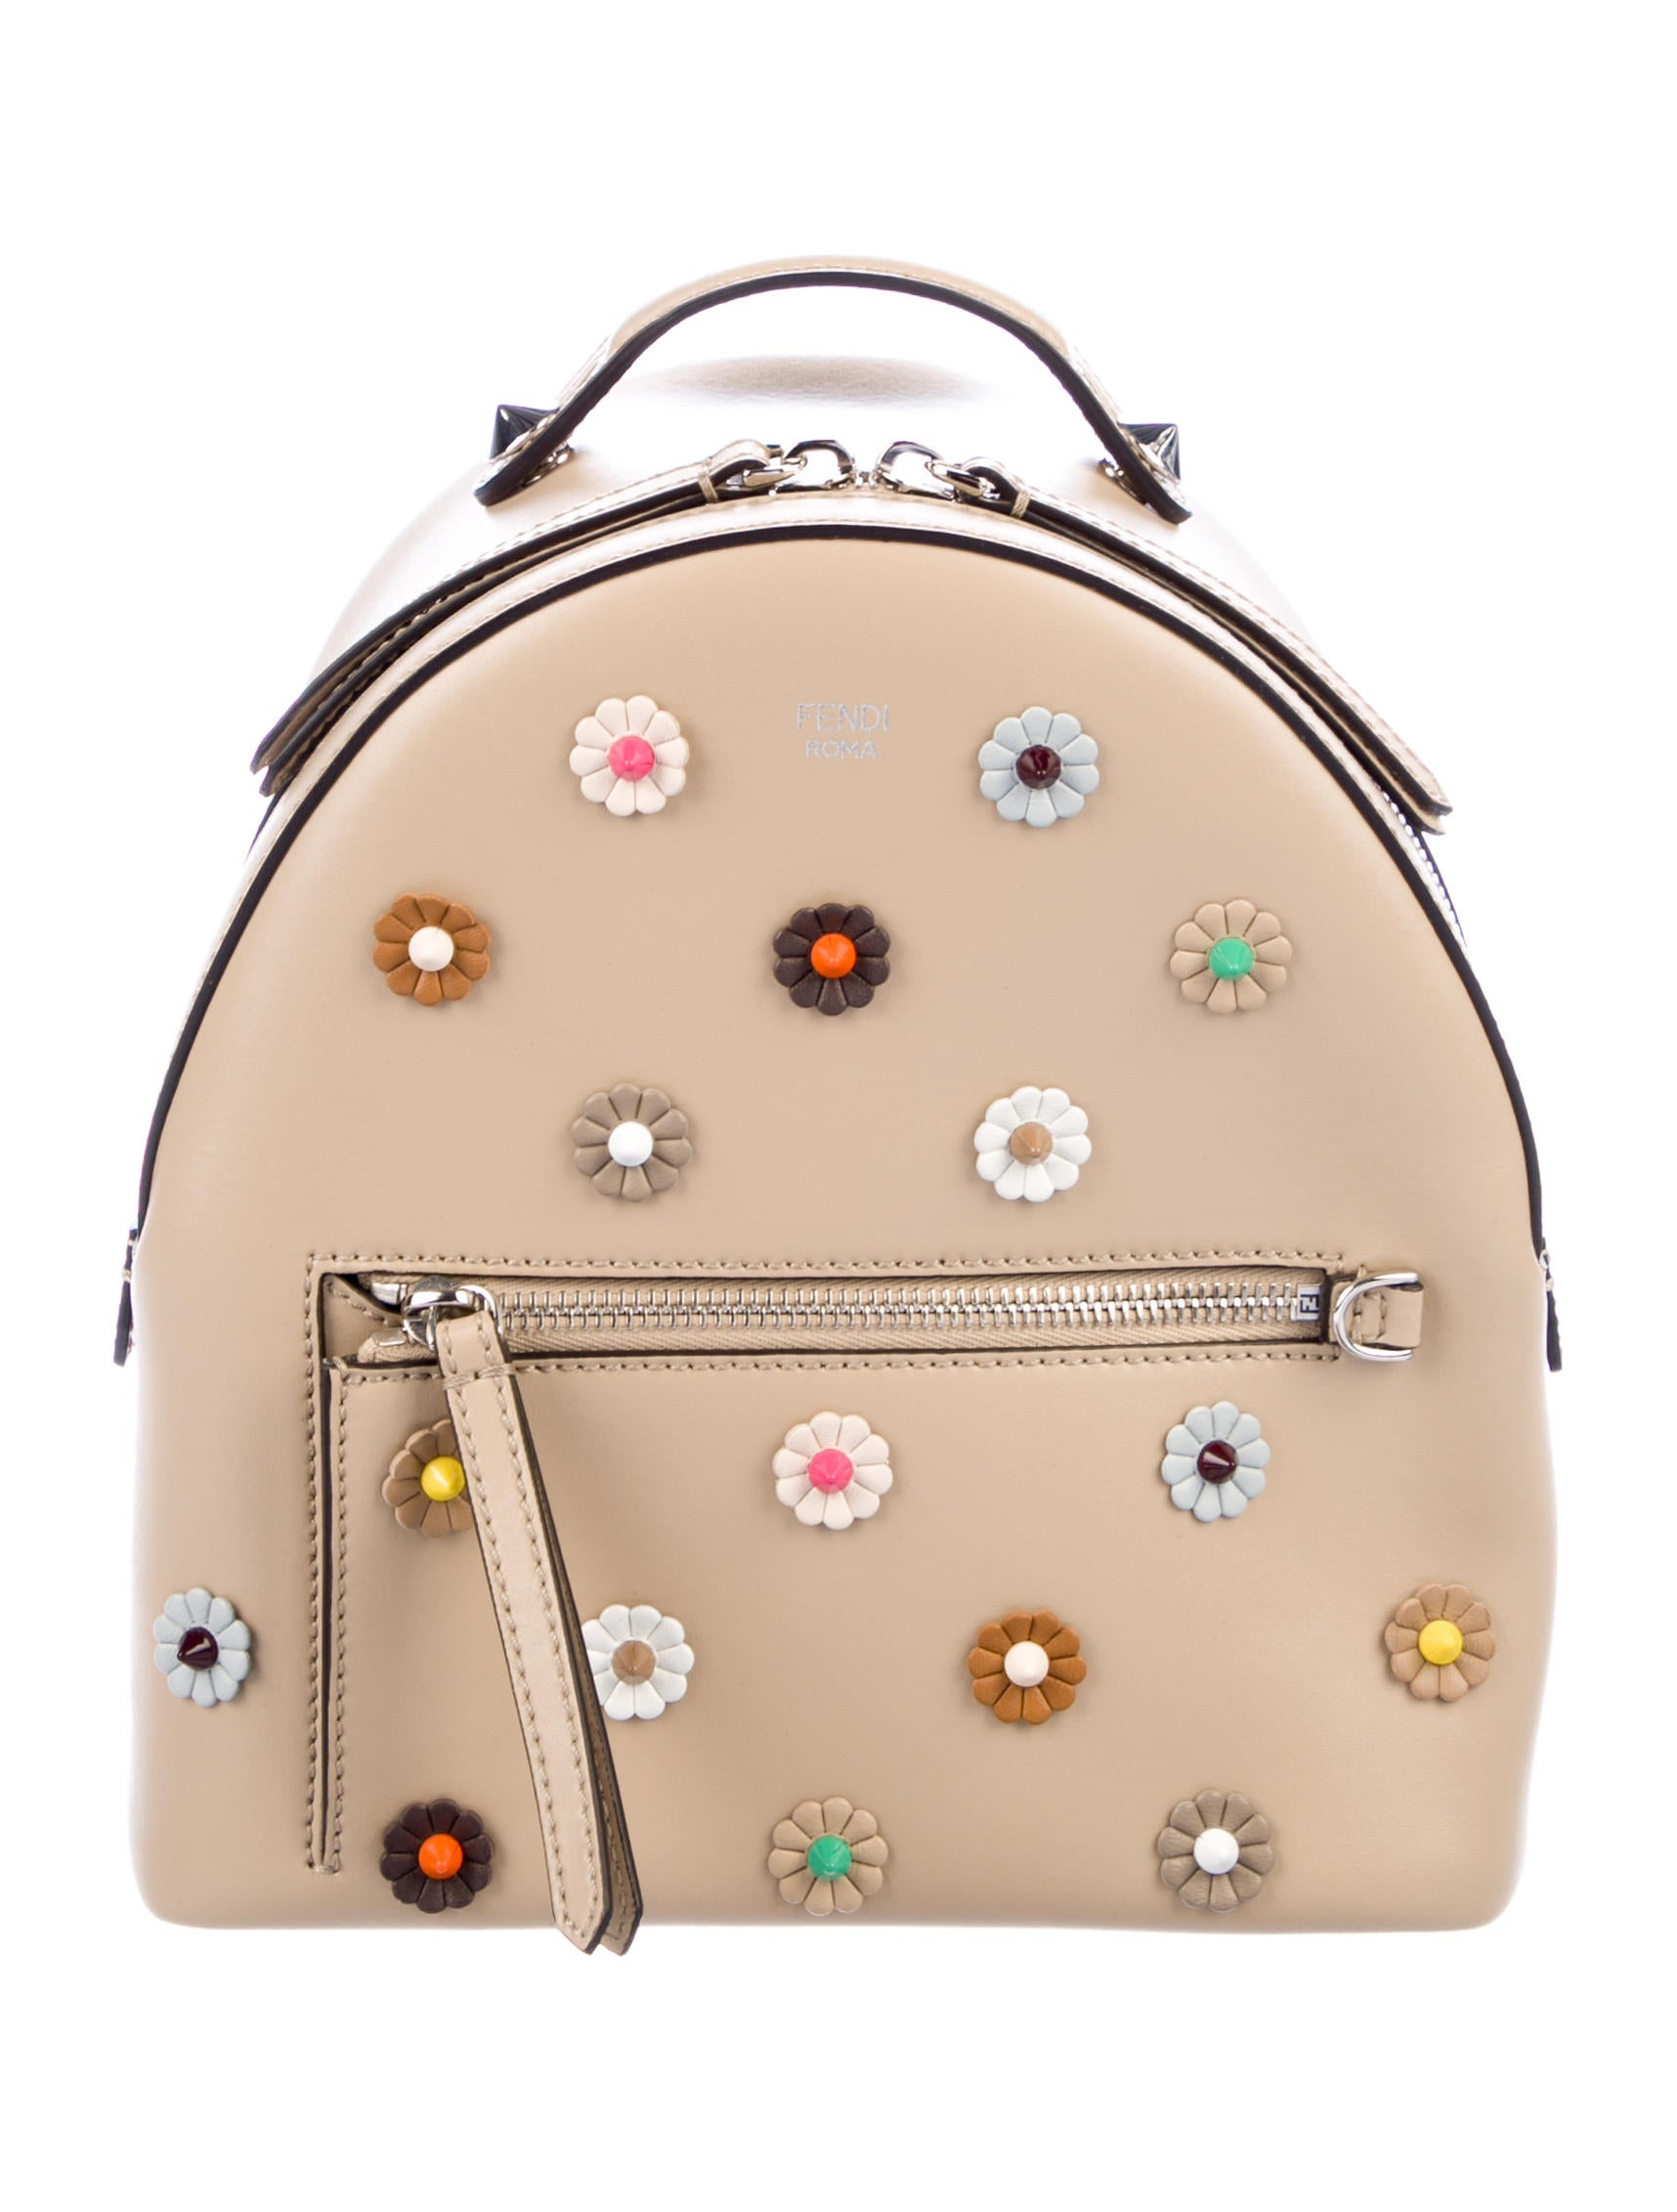 5fd30845c0b9 Fendi Mini Zaino Backpack w  Tags - Handbags - FEN81287